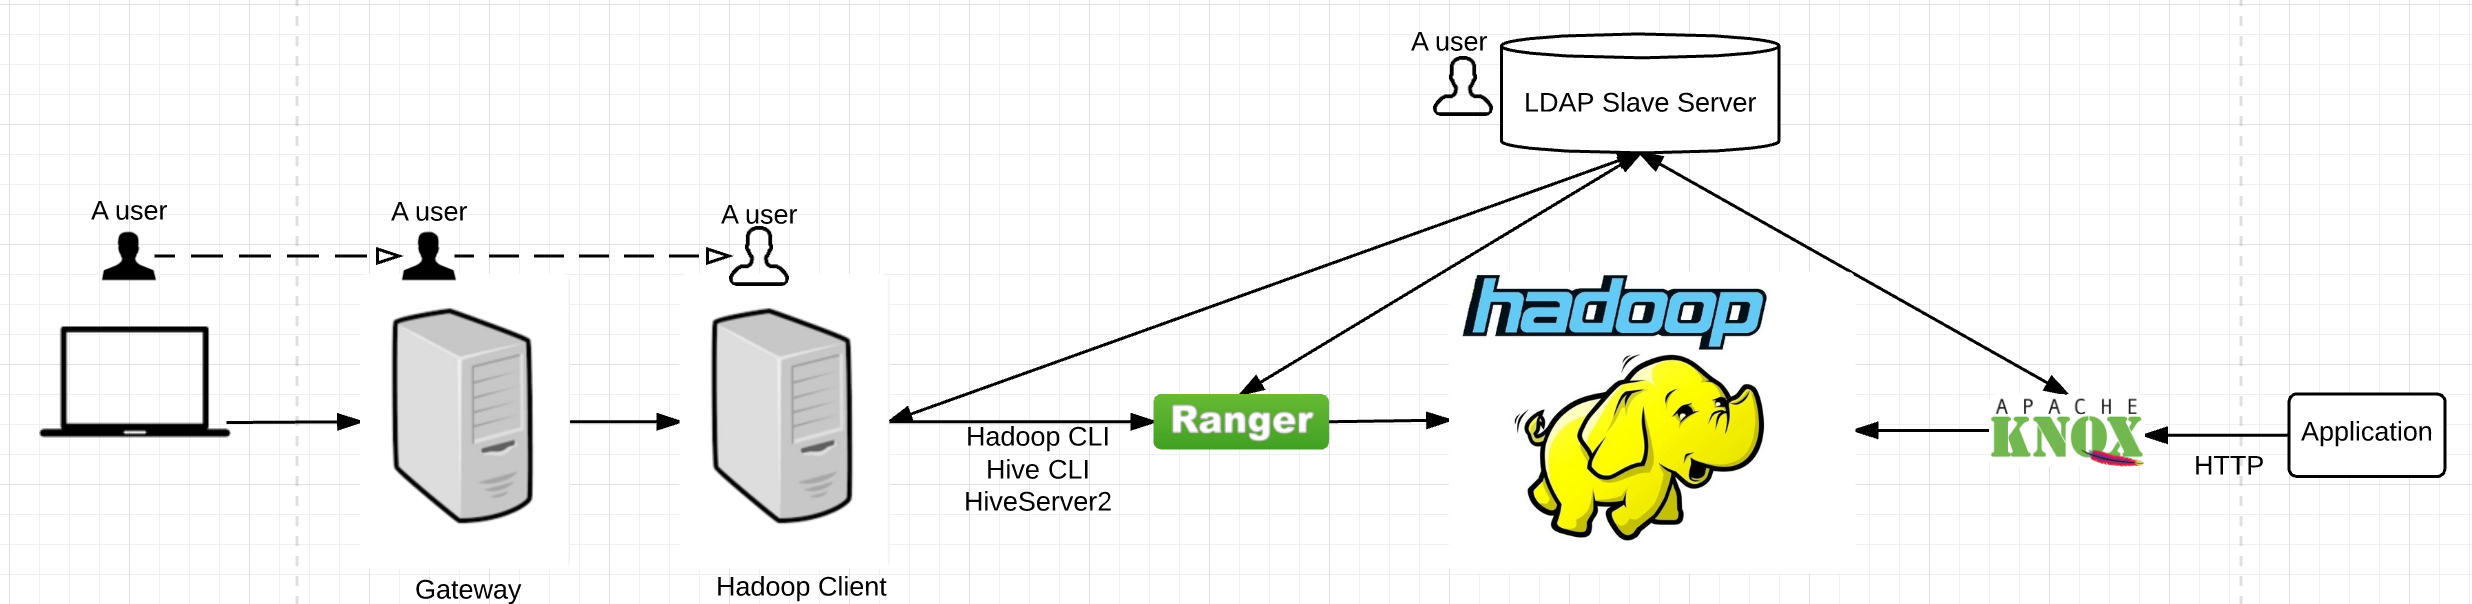 ldap_ranger_knox